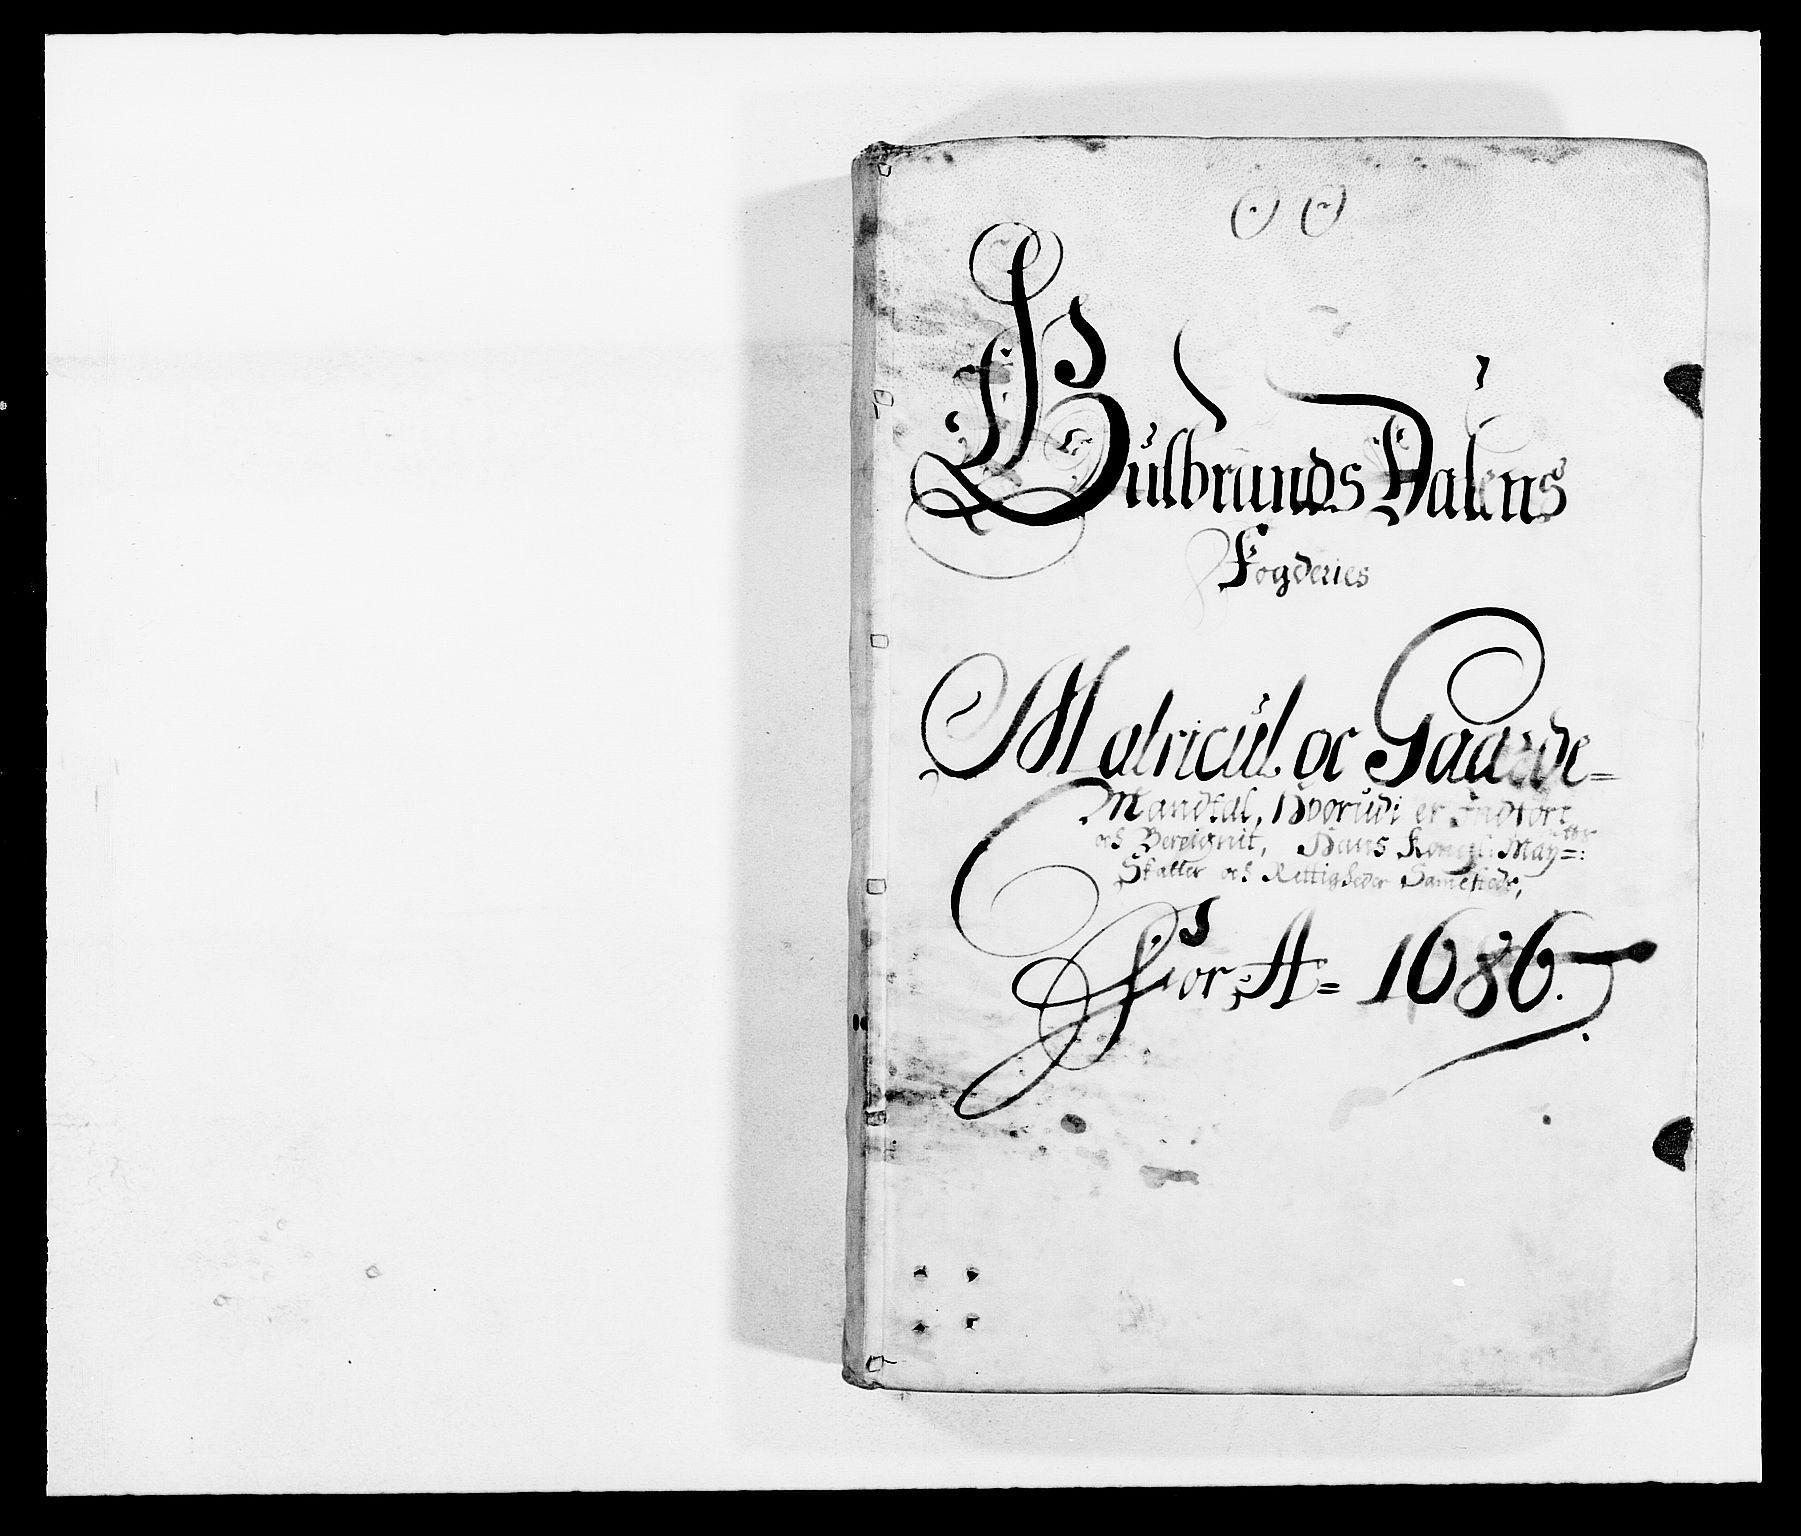 RA, Rentekammeret inntil 1814, Reviderte regnskaper, Fogderegnskap, R17/L1161: Fogderegnskap Gudbrandsdal, 1682-1689, s. 47